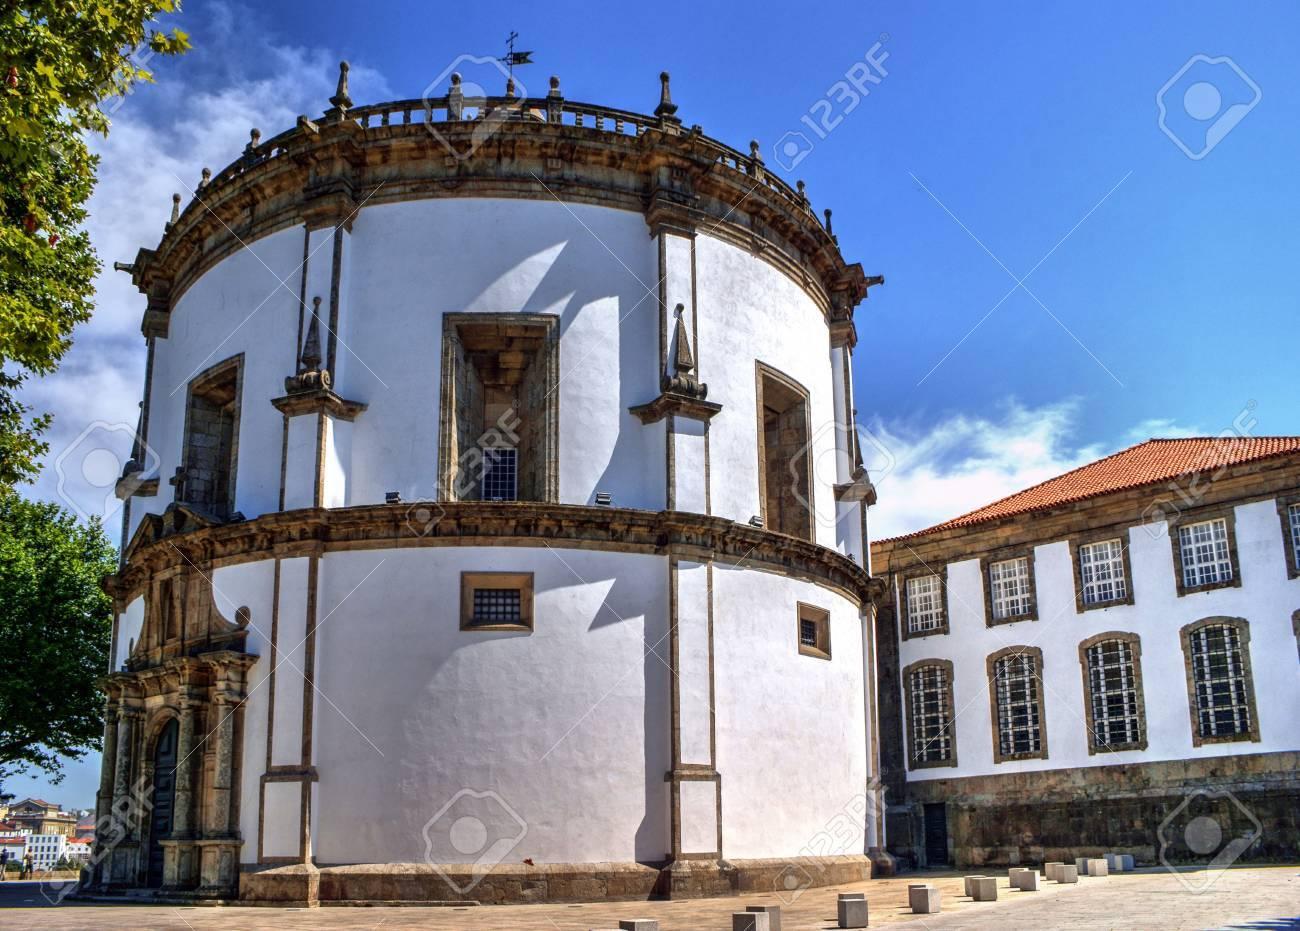 Serra do pilar monastery in Vila Nova de Gaia, Portugal Stock Photo - 67013824